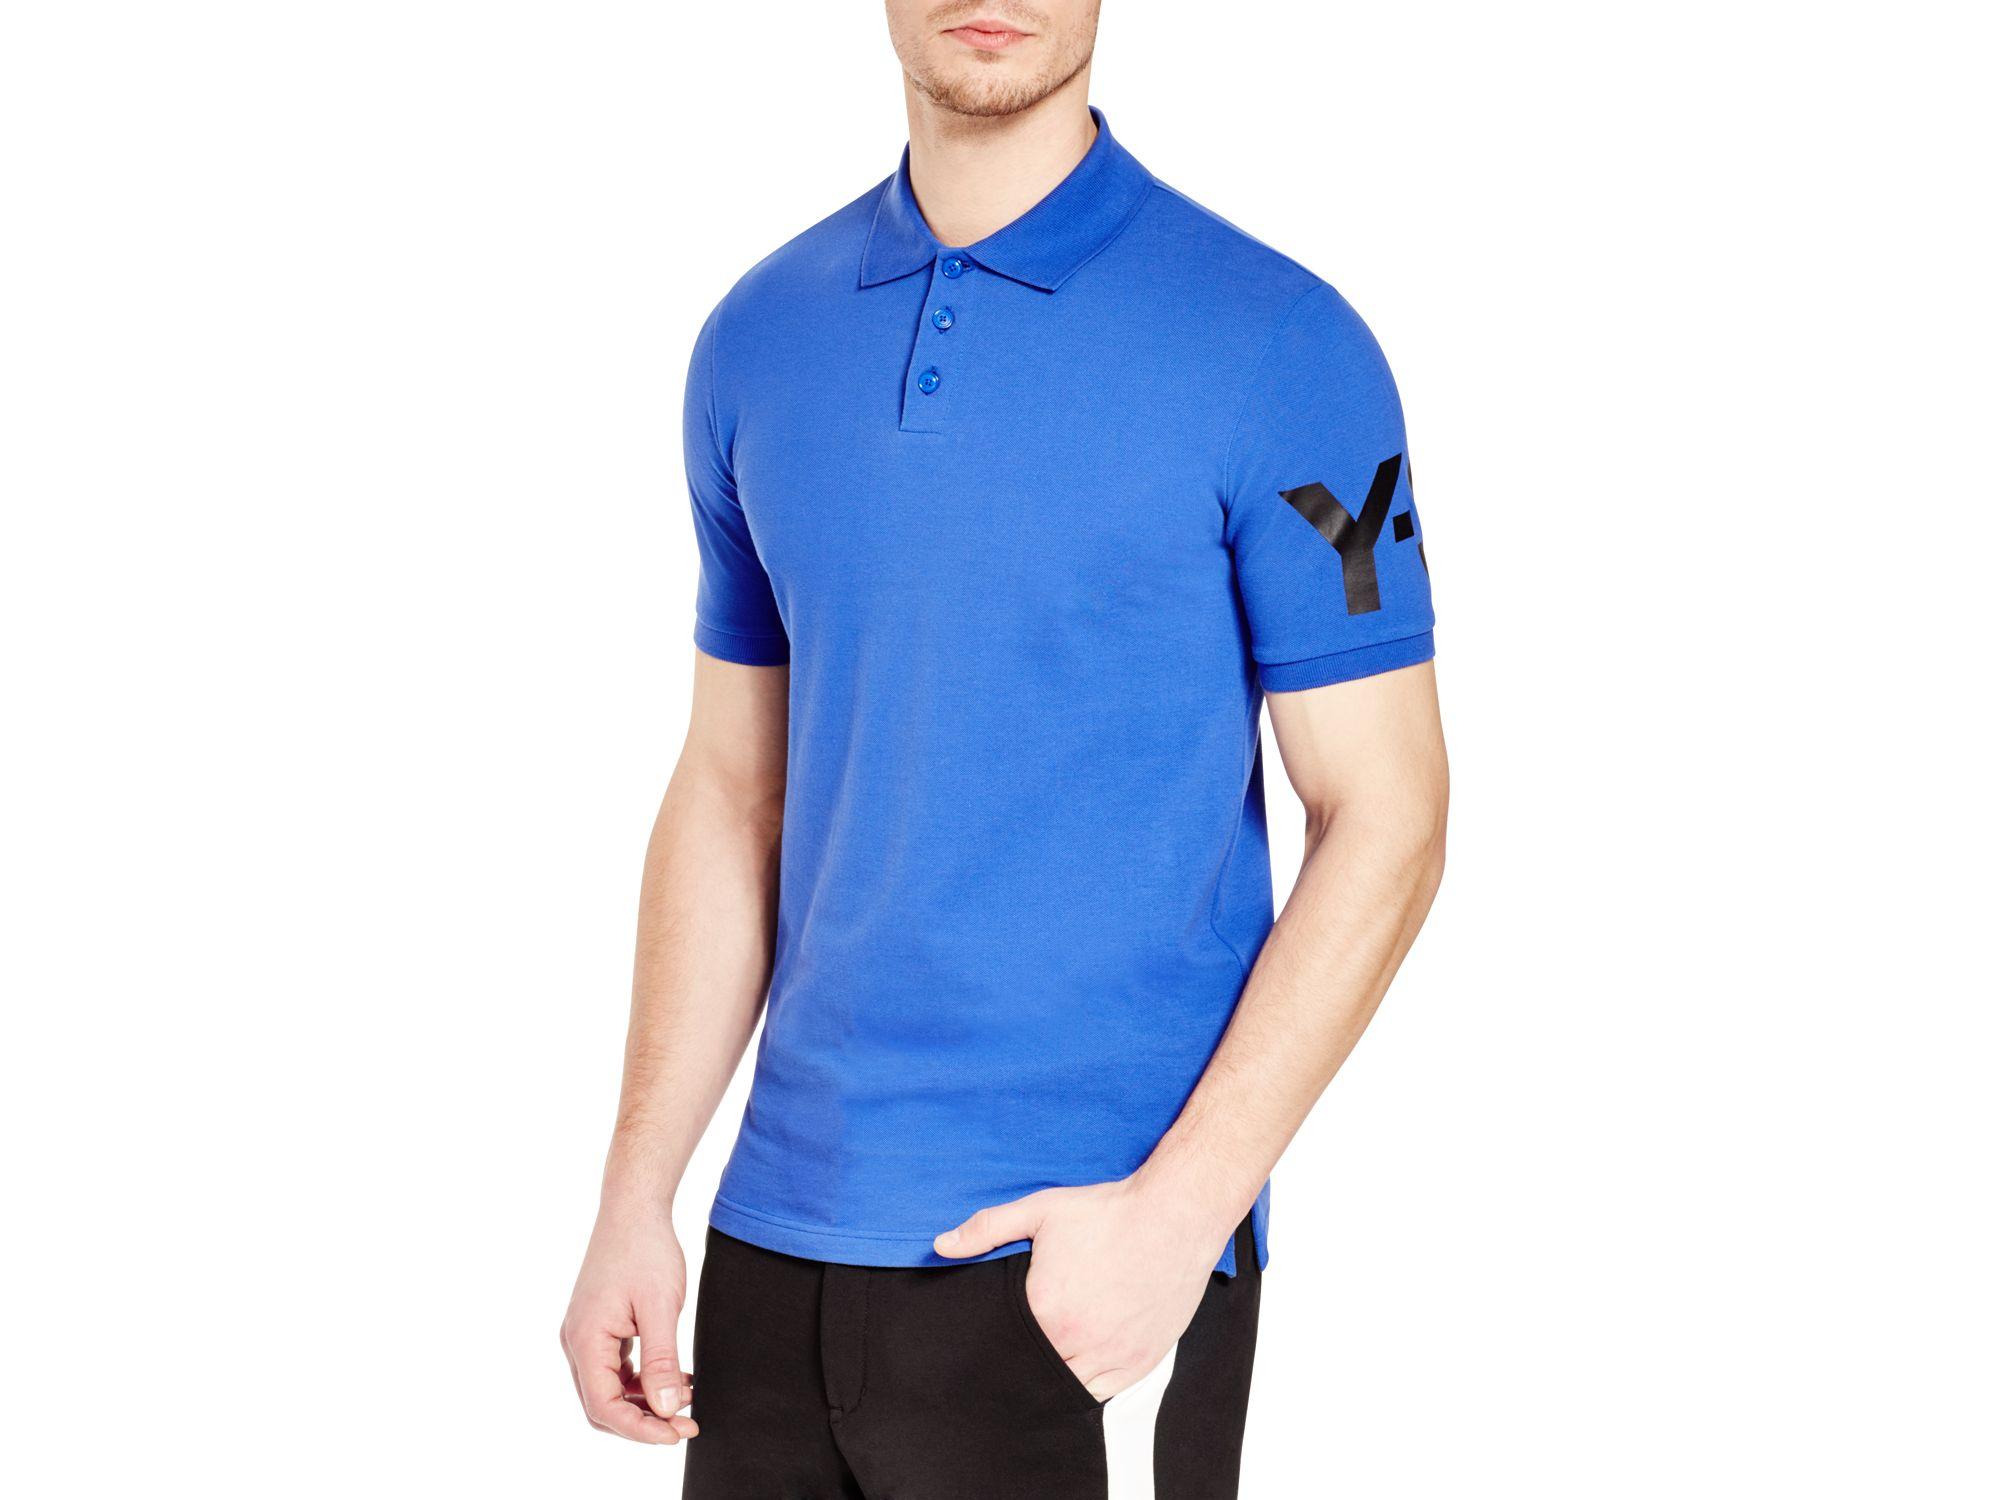 6d5b74ec7 Y3 Classic Polo Shirt - DREAMWORKS